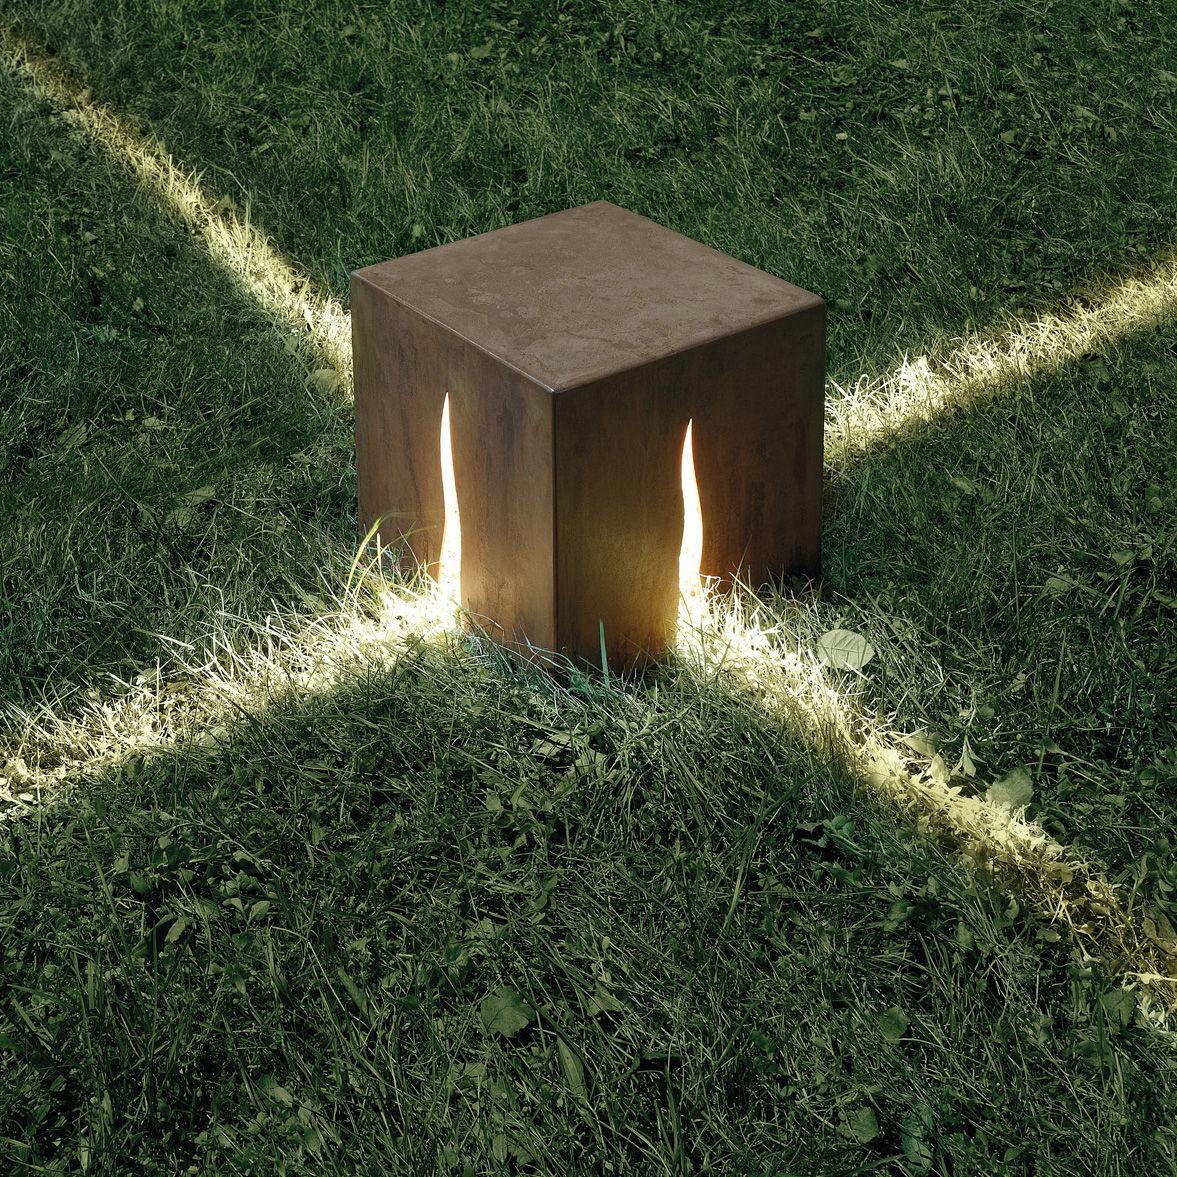 Lampe de sol granito h 30 cm pour l 39 ext rieur h 30 cm - Terra da giardino ...